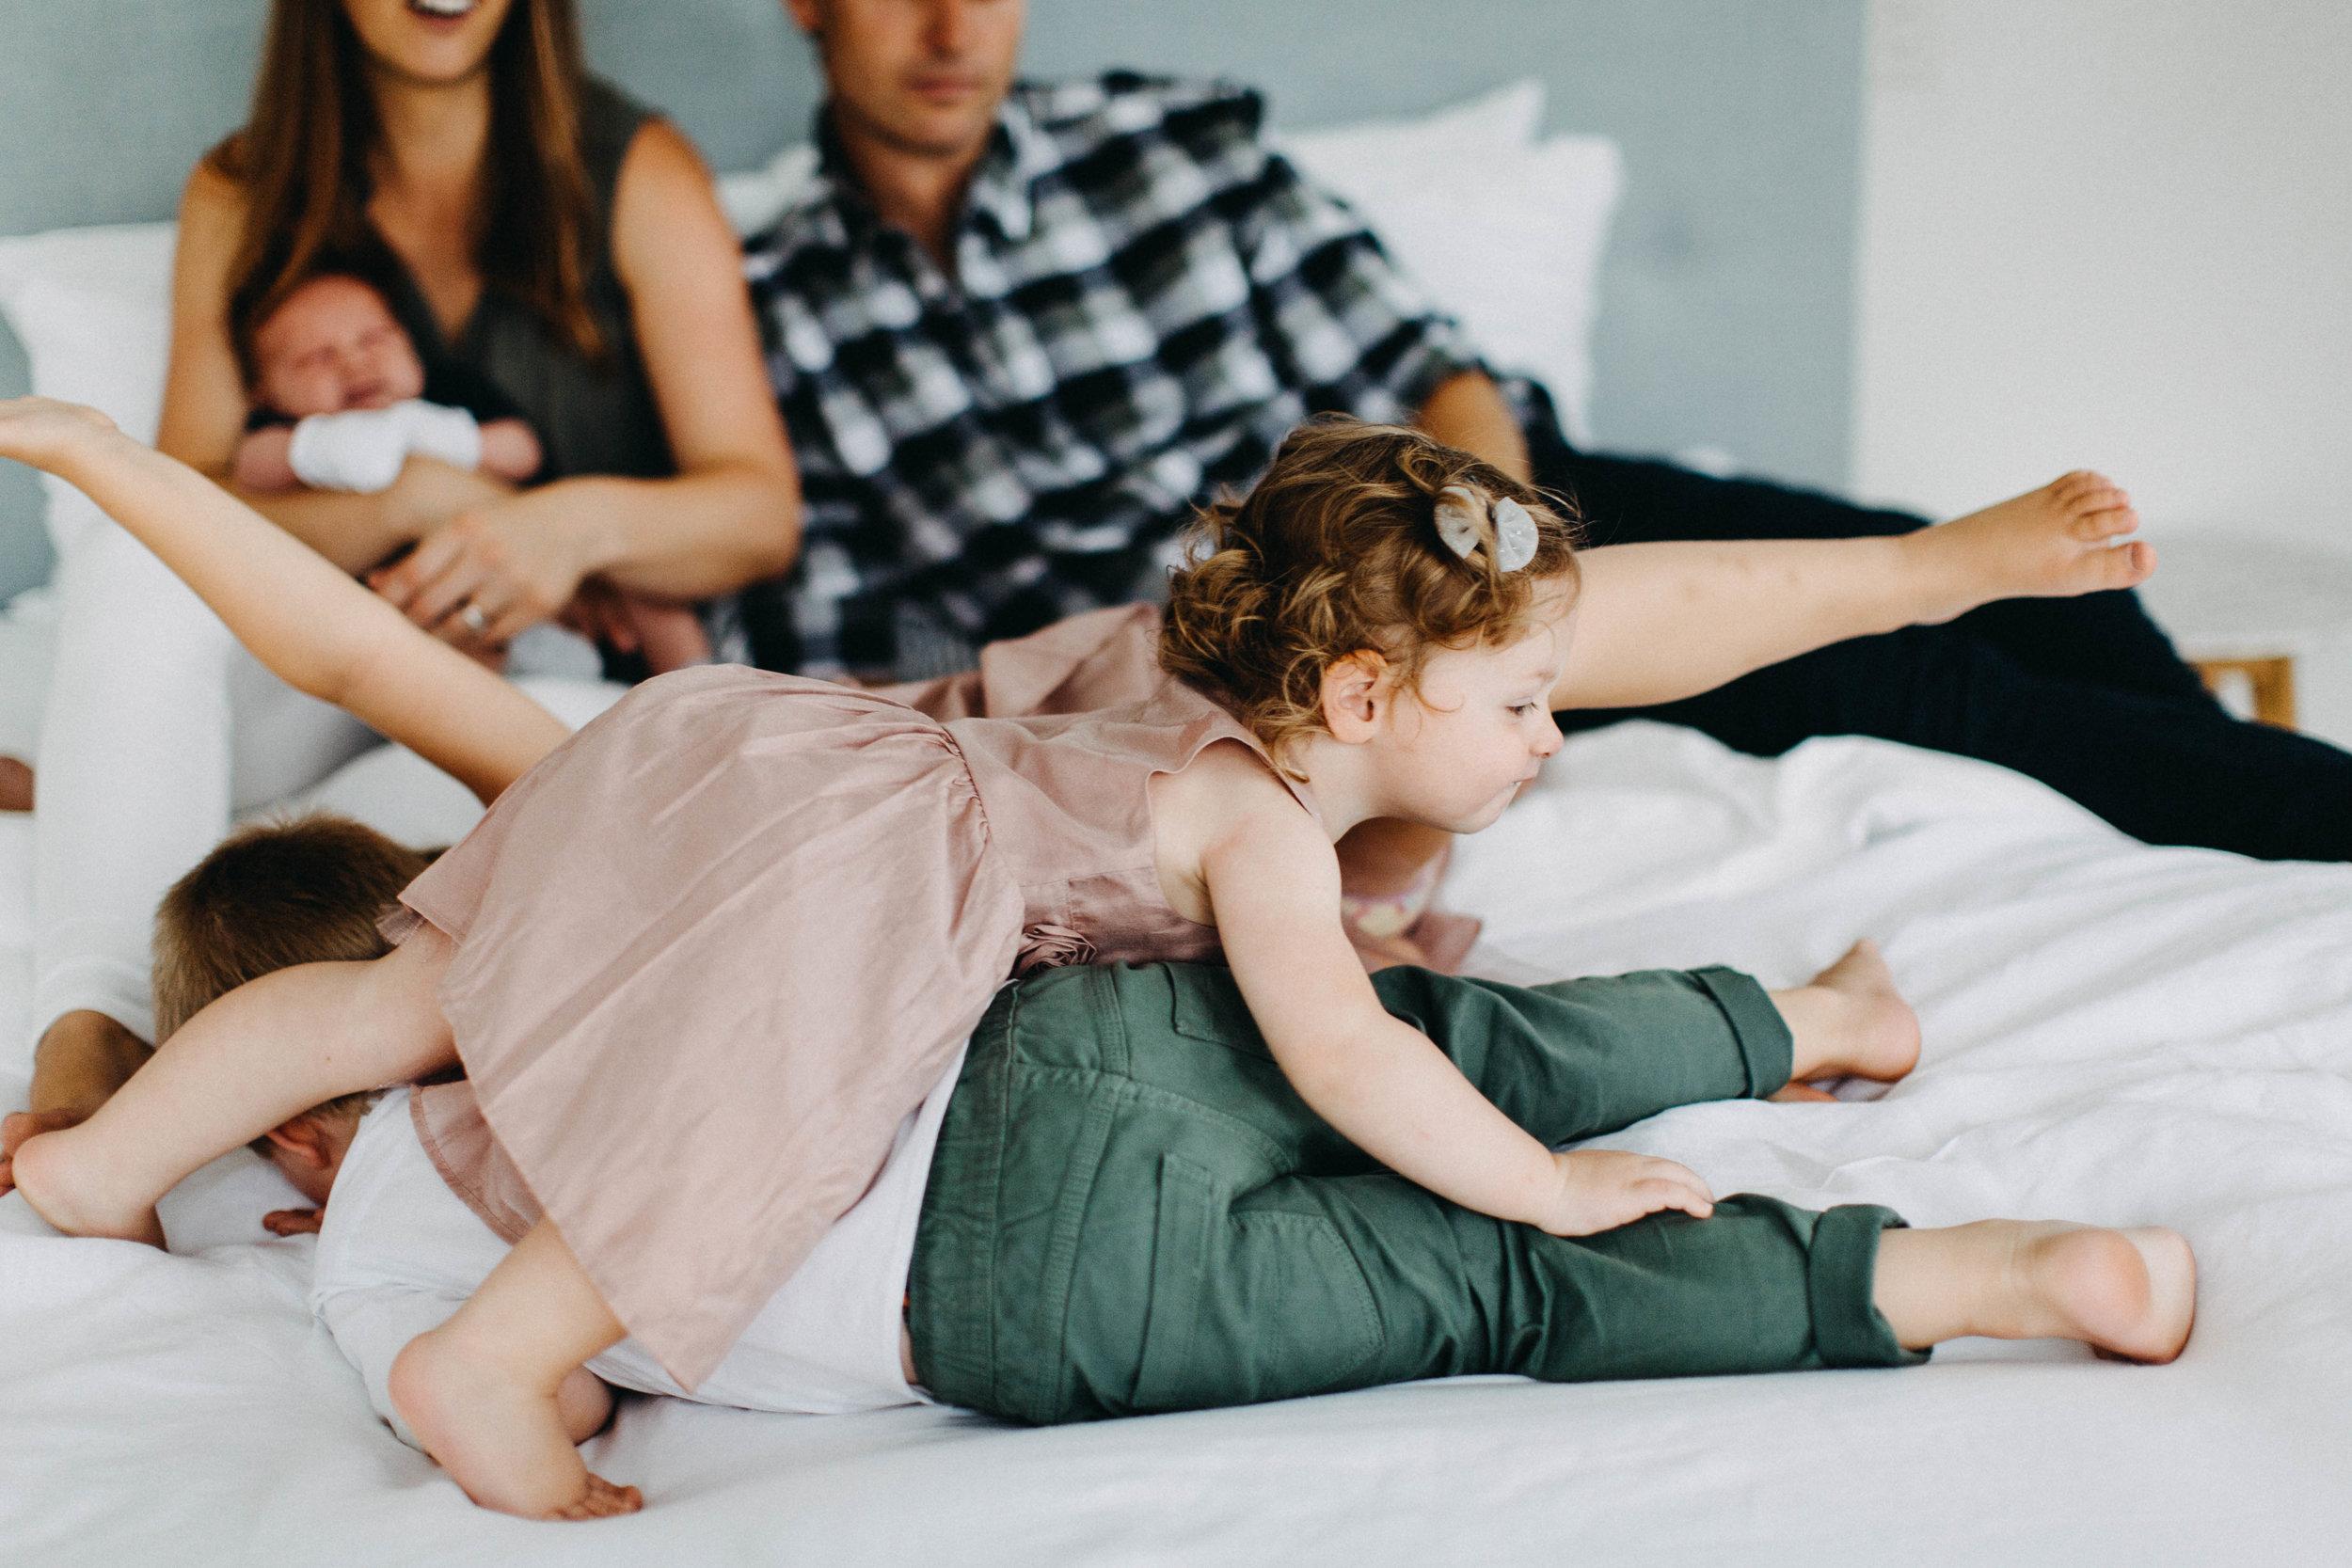 lifestye-family-photography-macarthur-emily-obrien-photography-25.jpg